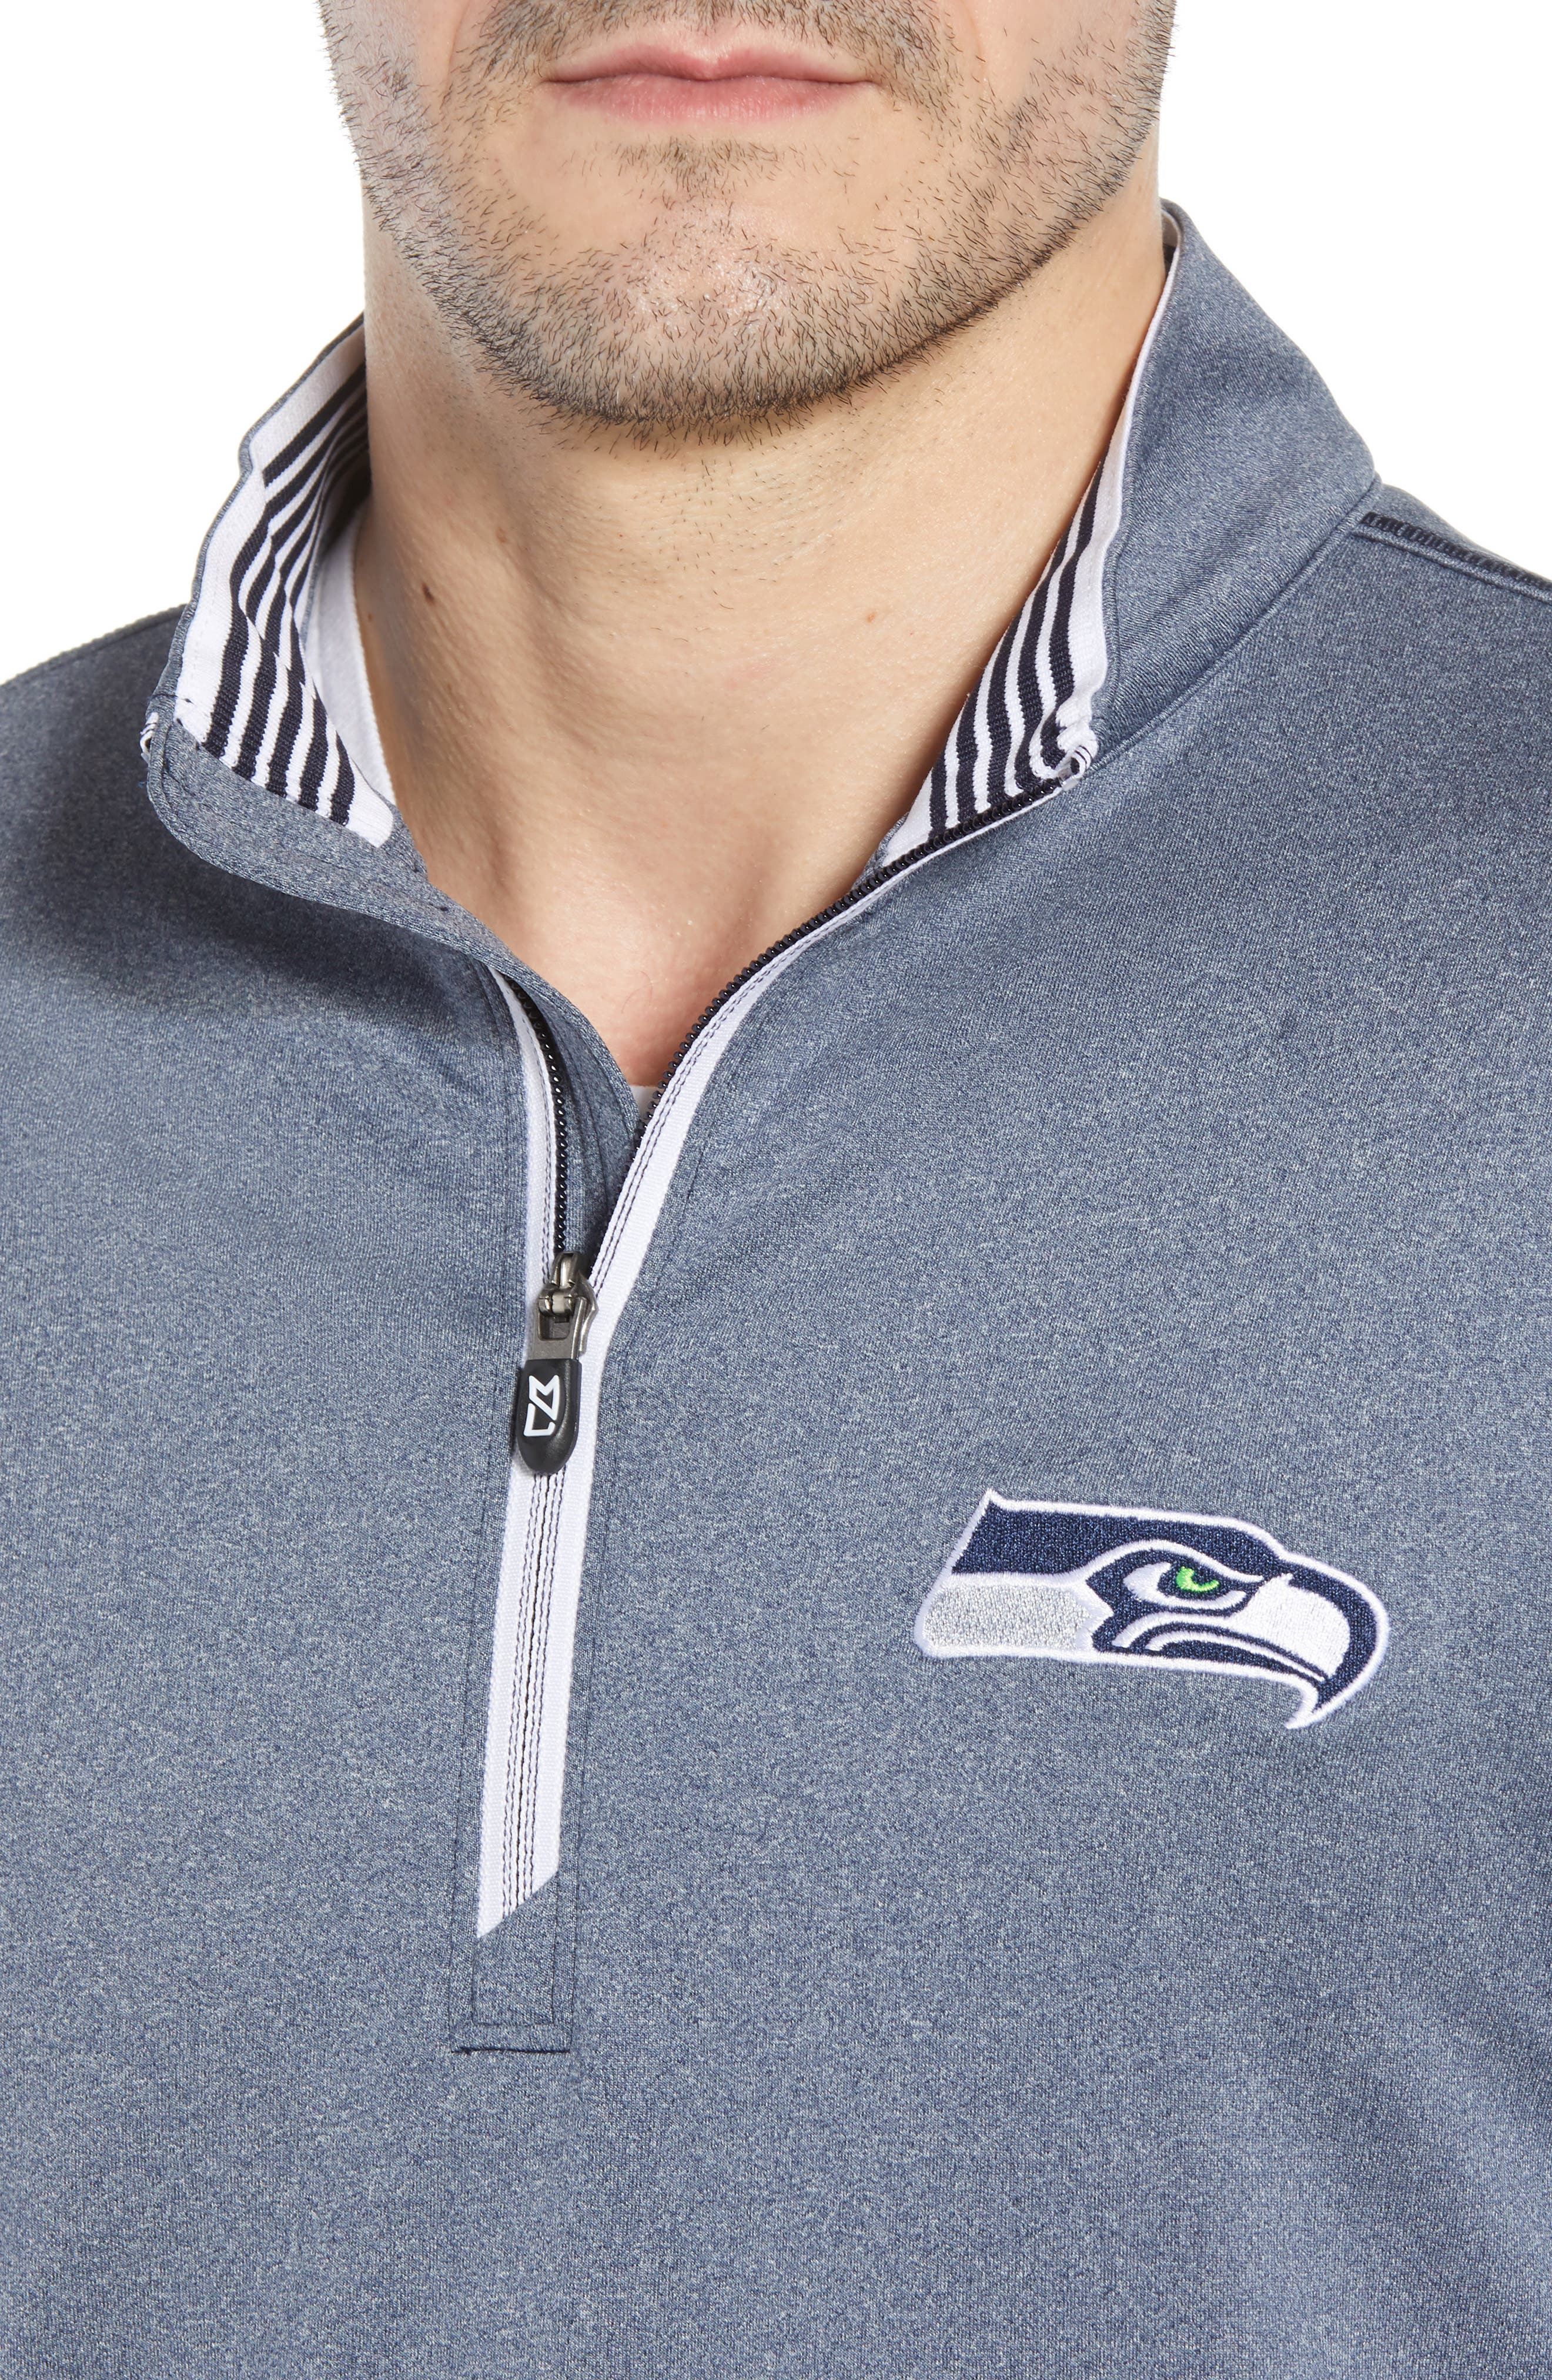 Endurance Seattle Seahawks Regular Fit Pullover,                             Alternate thumbnail 4, color,                             LIBERTY NAVY HEATHER